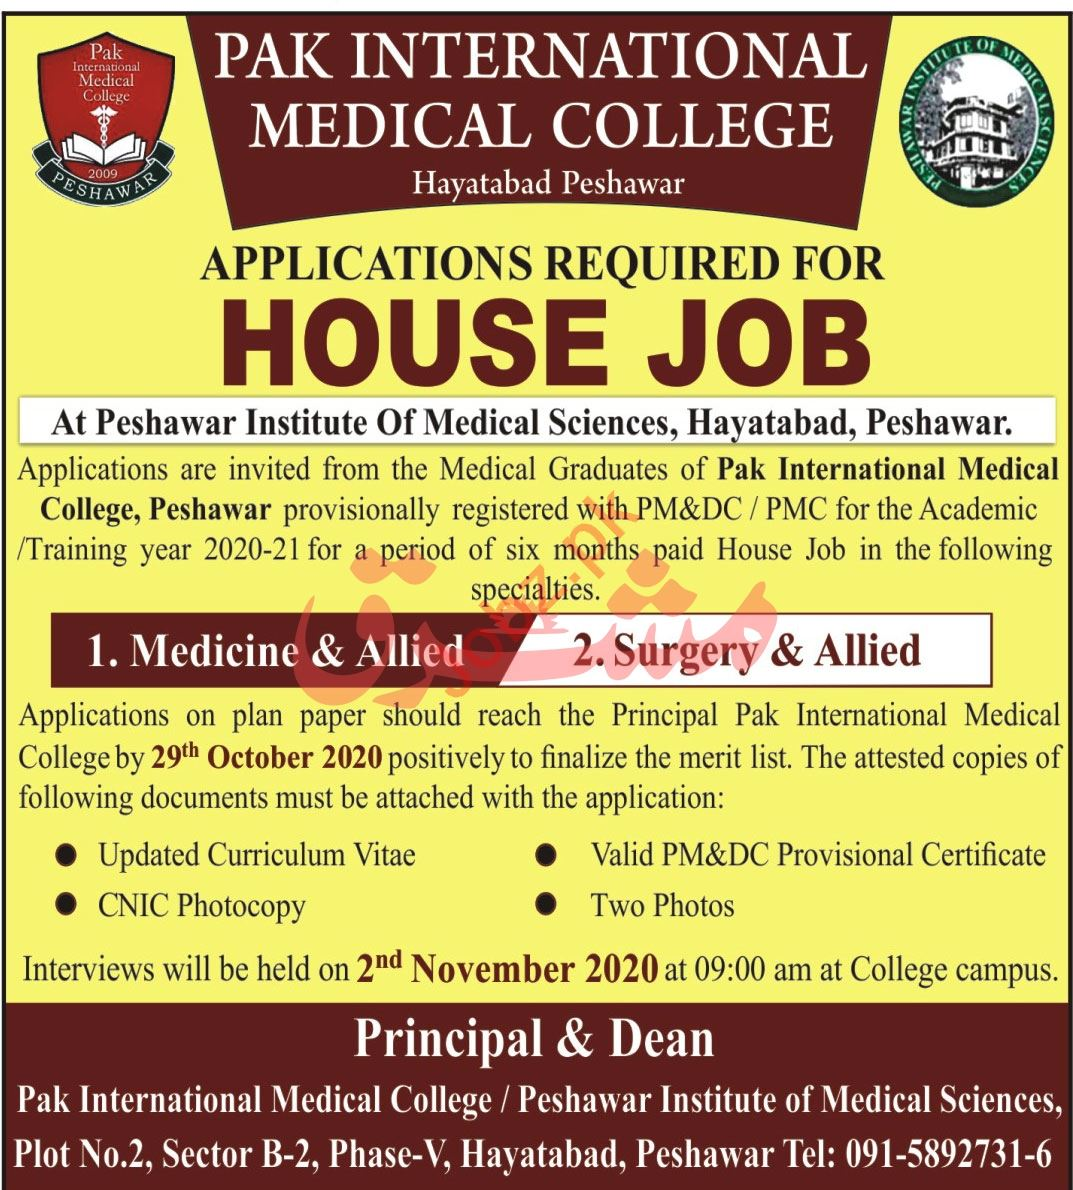 Pak International Medical College Peshawar House Jobs 2020